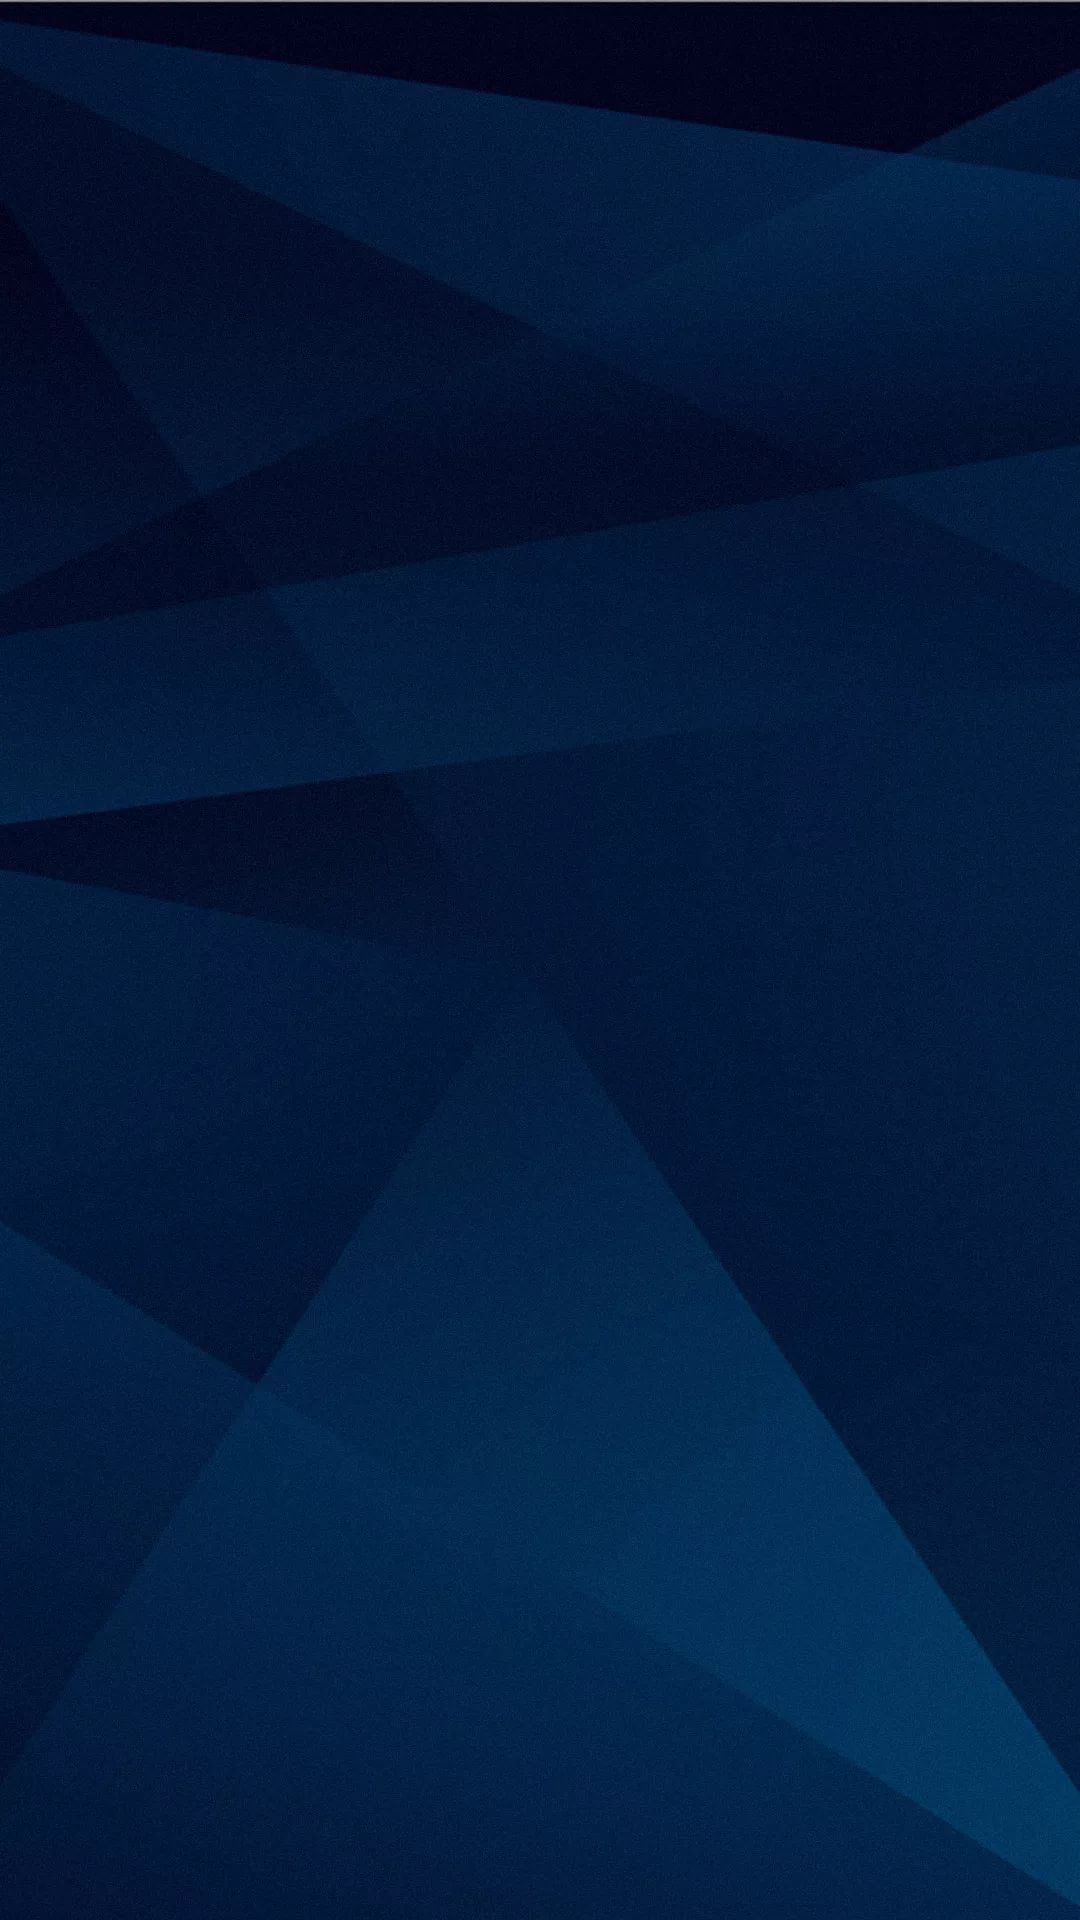 Dark Blue phone wallpaper